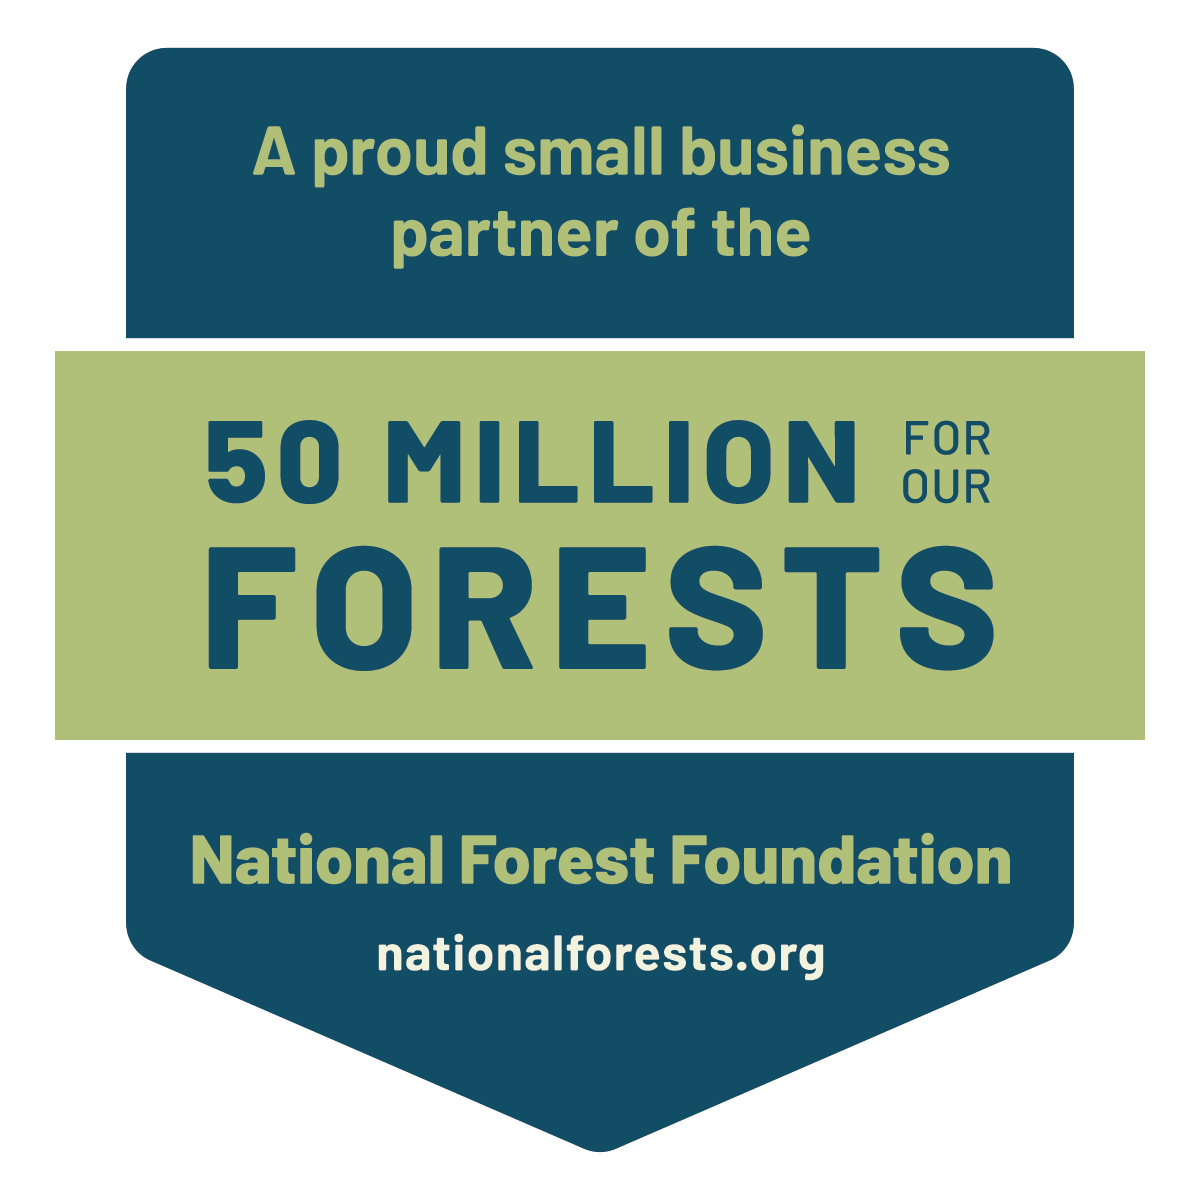 50 Million Forests LaGrange, IL Herr Capital Management, LLC